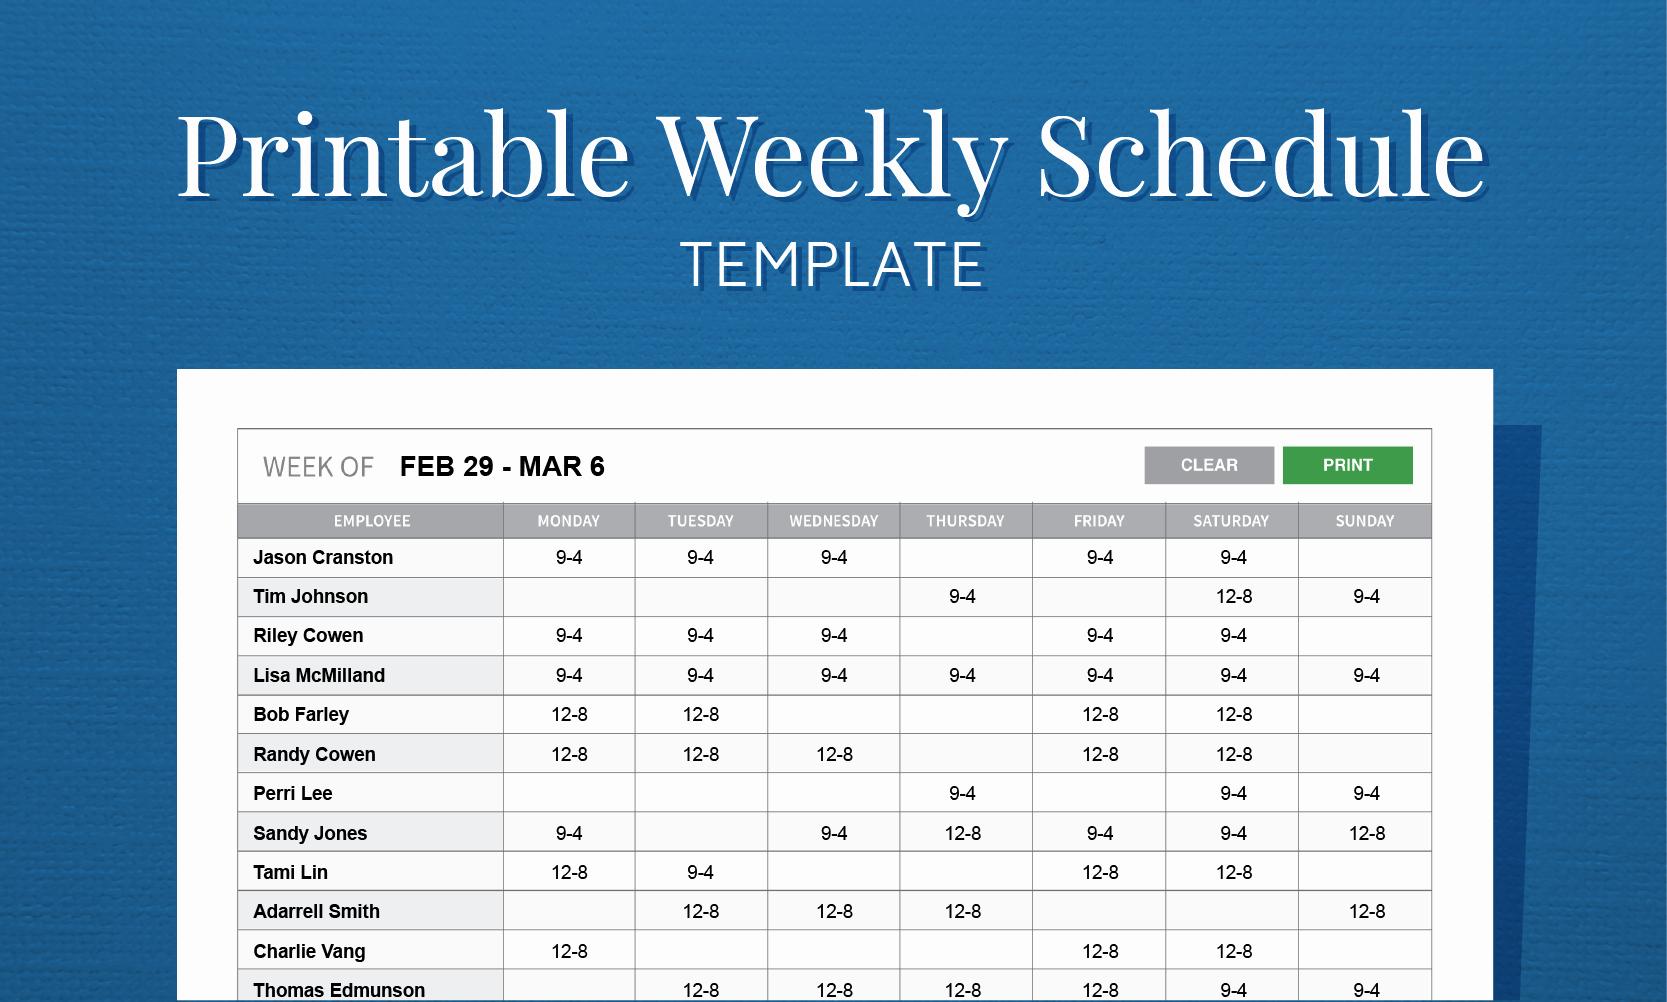 Free Weekly Work Schedule Template Fresh Free Printable Weekly Work Schedule Template for Employee